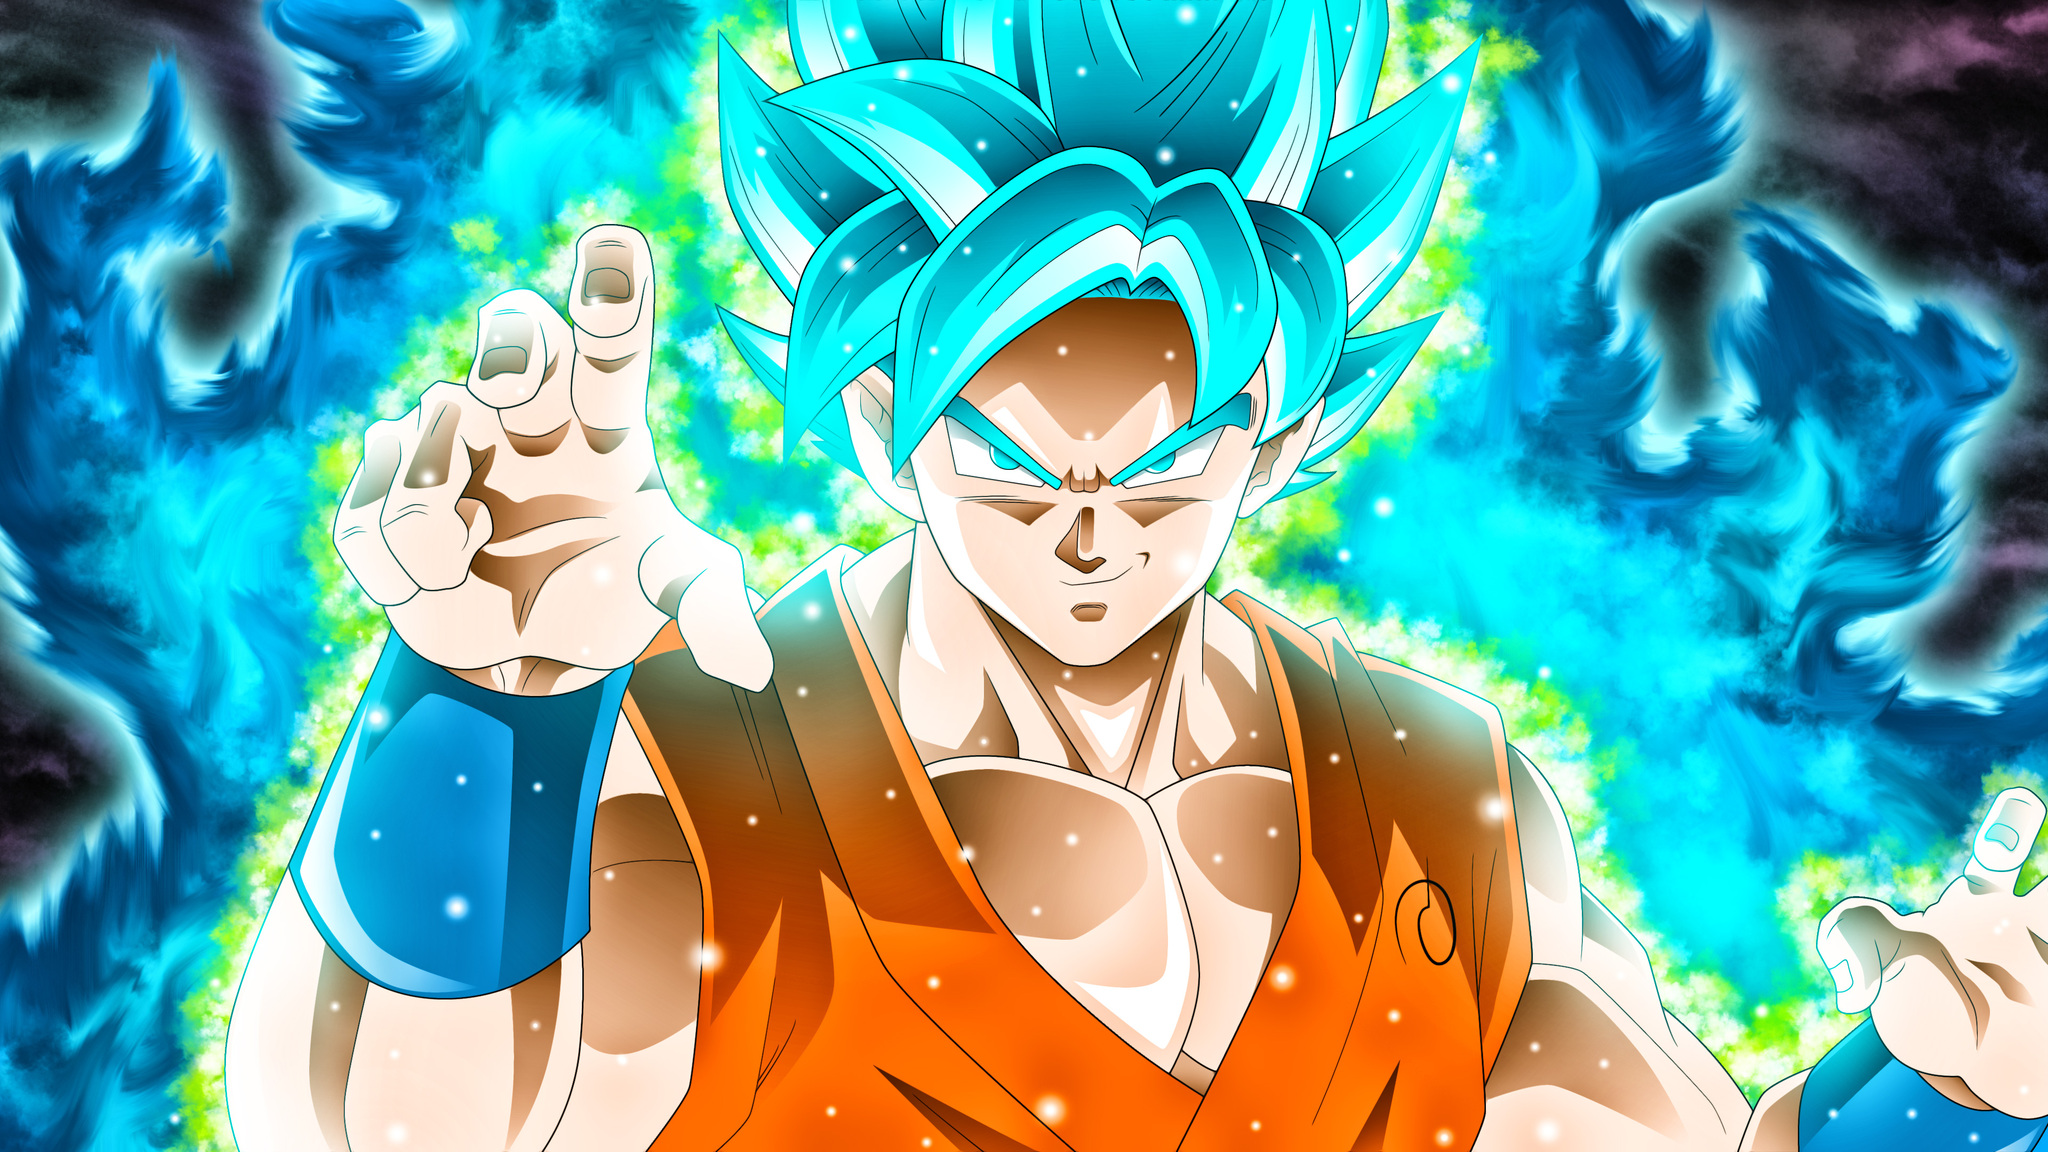 2048x1152 Goku Dragon Ball Super 2048x1152 Resolution HD 4k